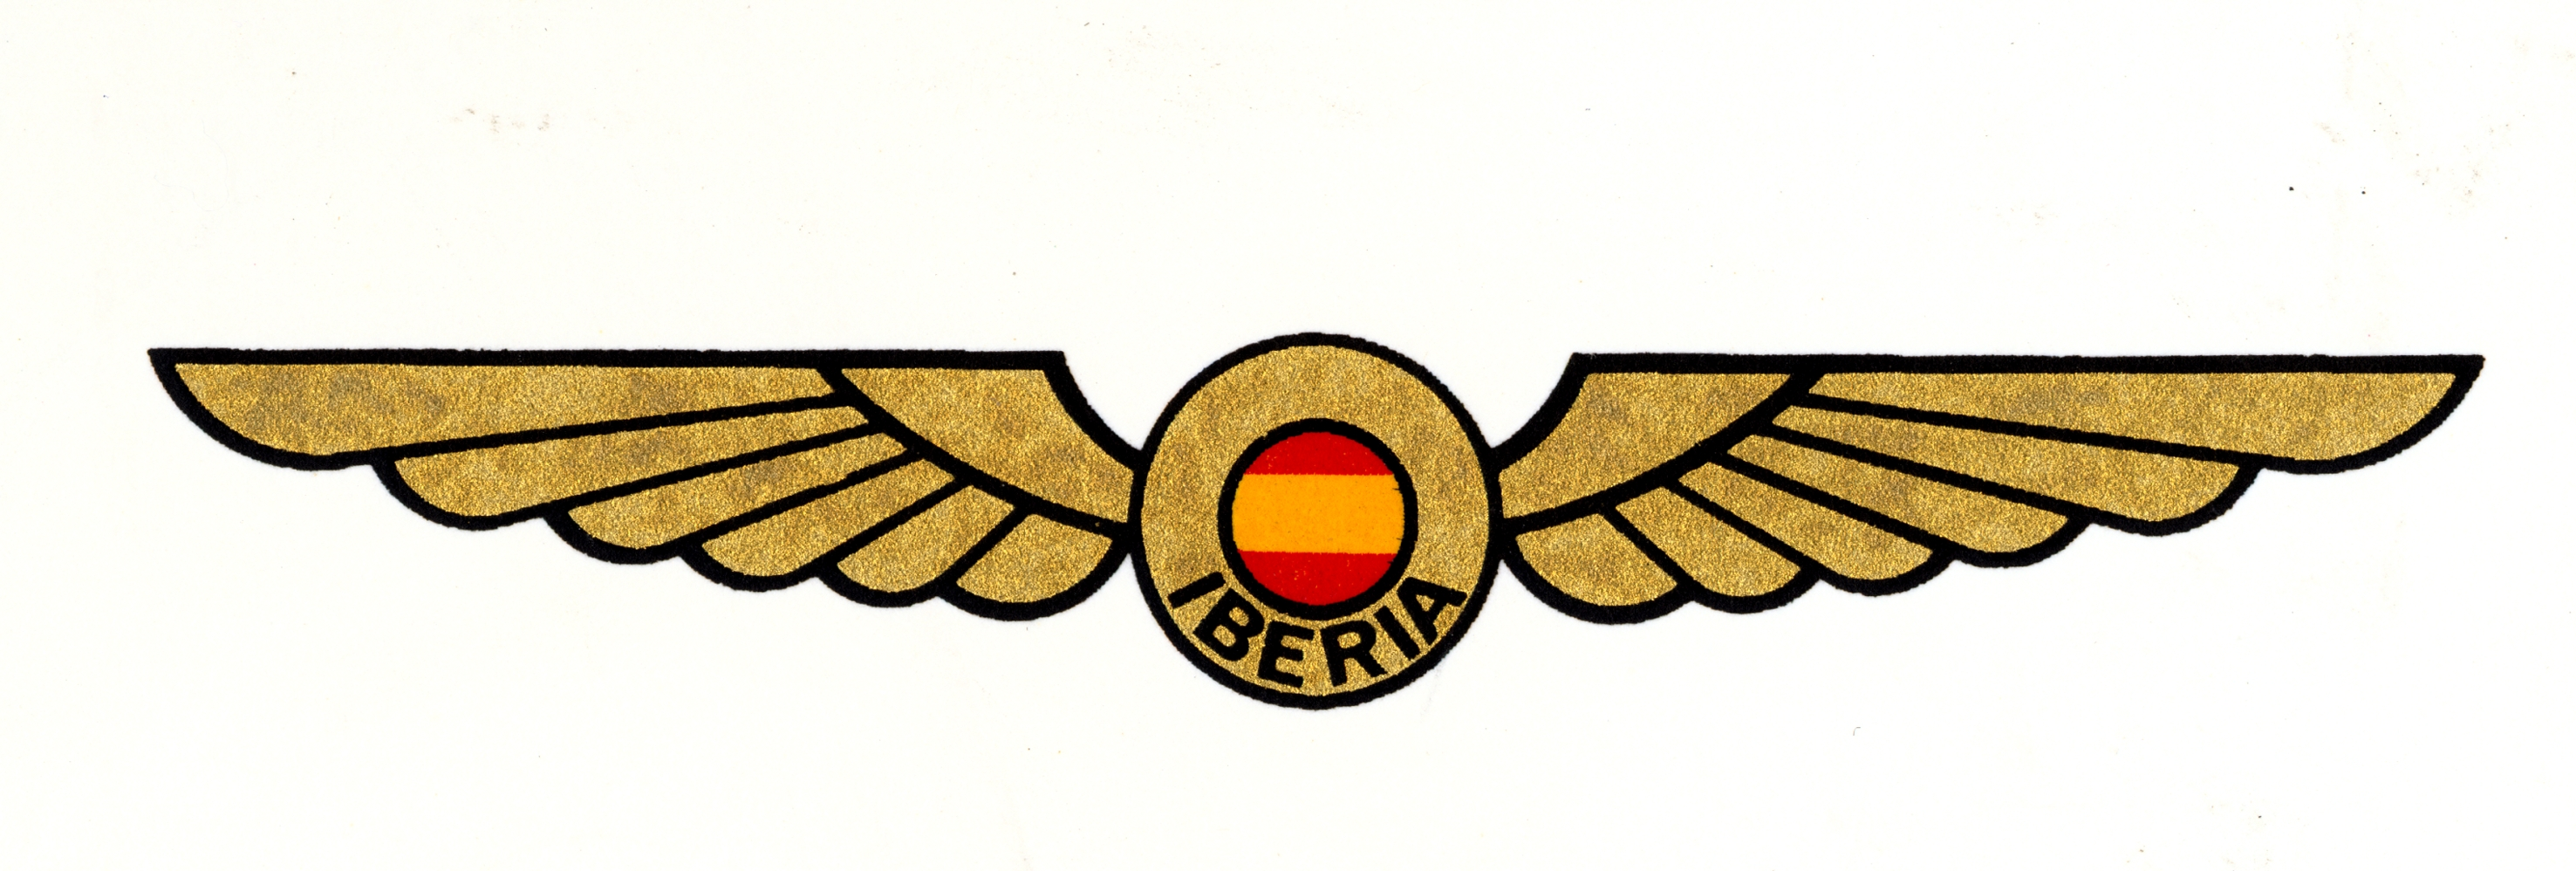 Iberia Logo Wallpaper